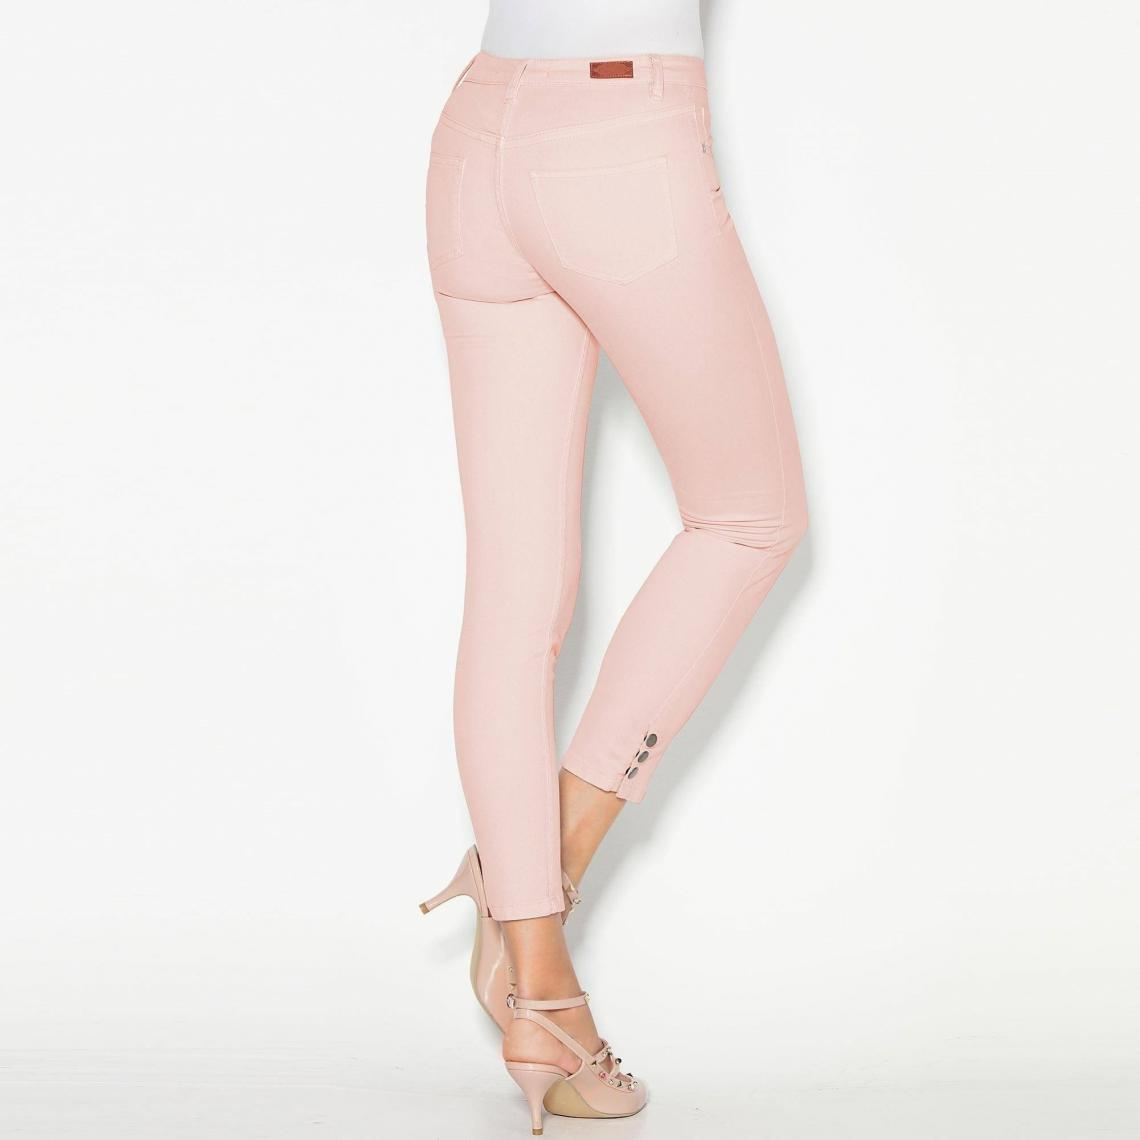 pantalon femme rose